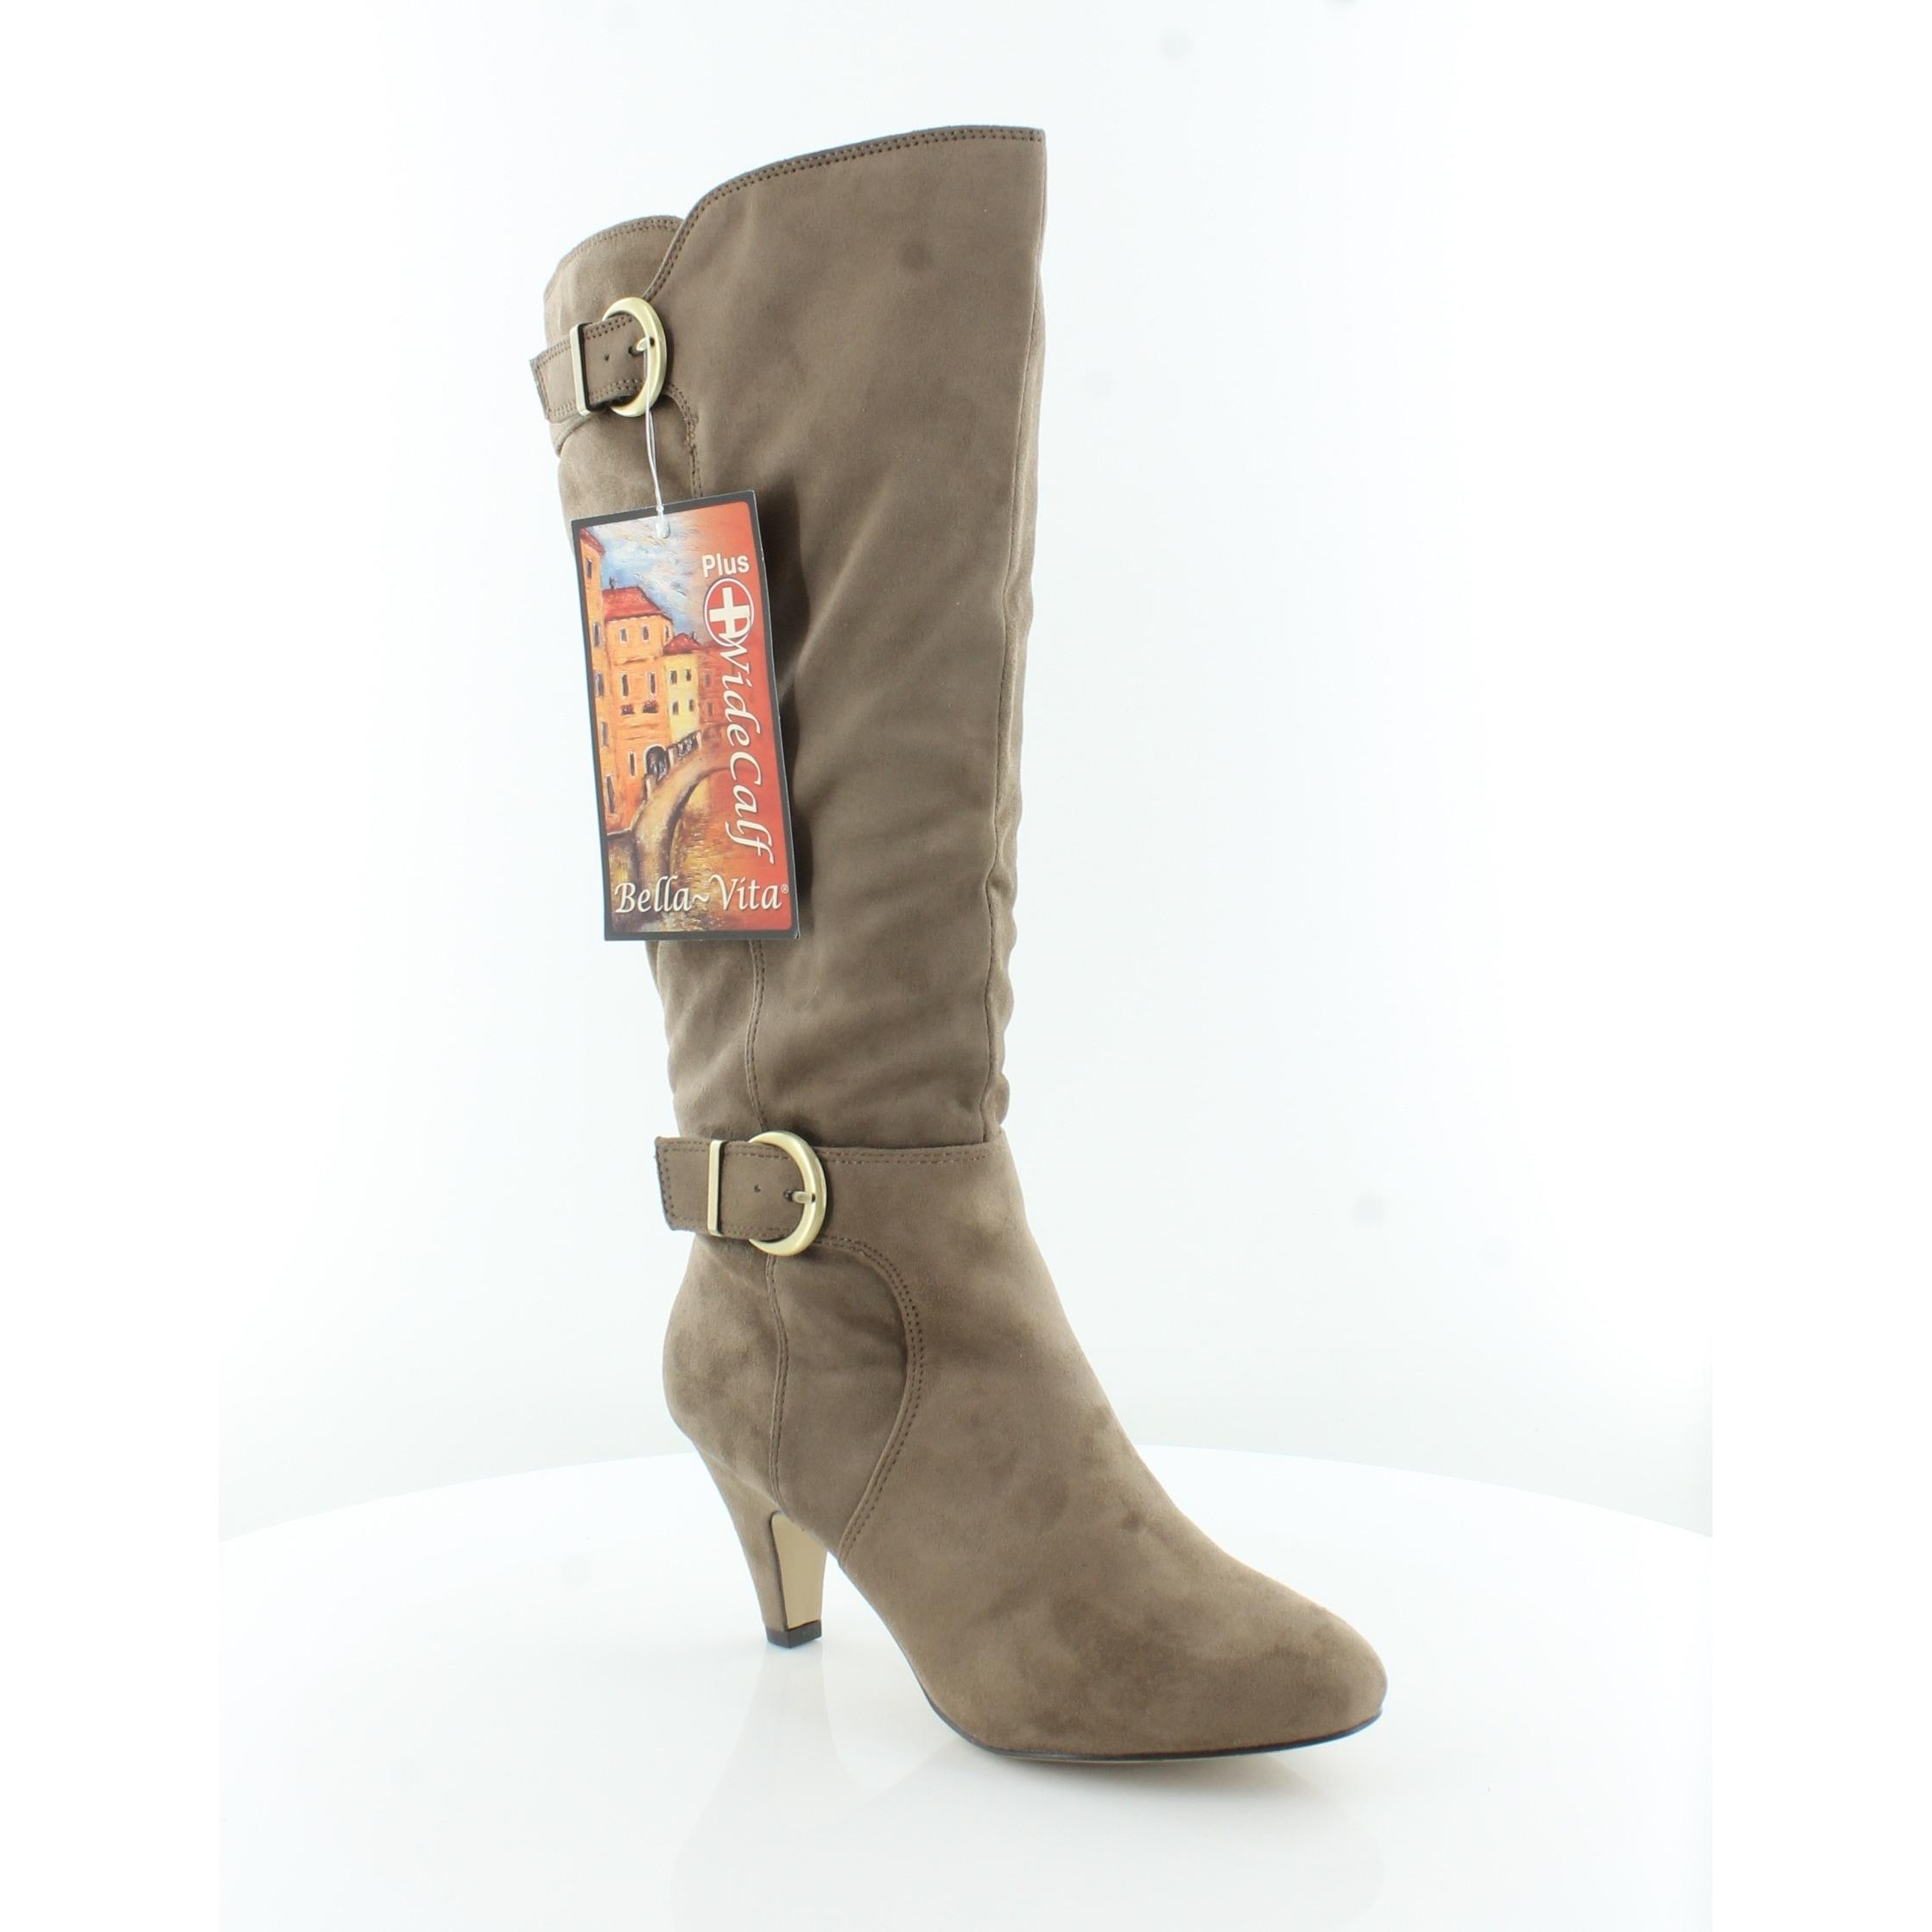 9afbfe695d1 Shop Bella Vita Toni II Women s Boots Fawn - Free Shipping Today ...